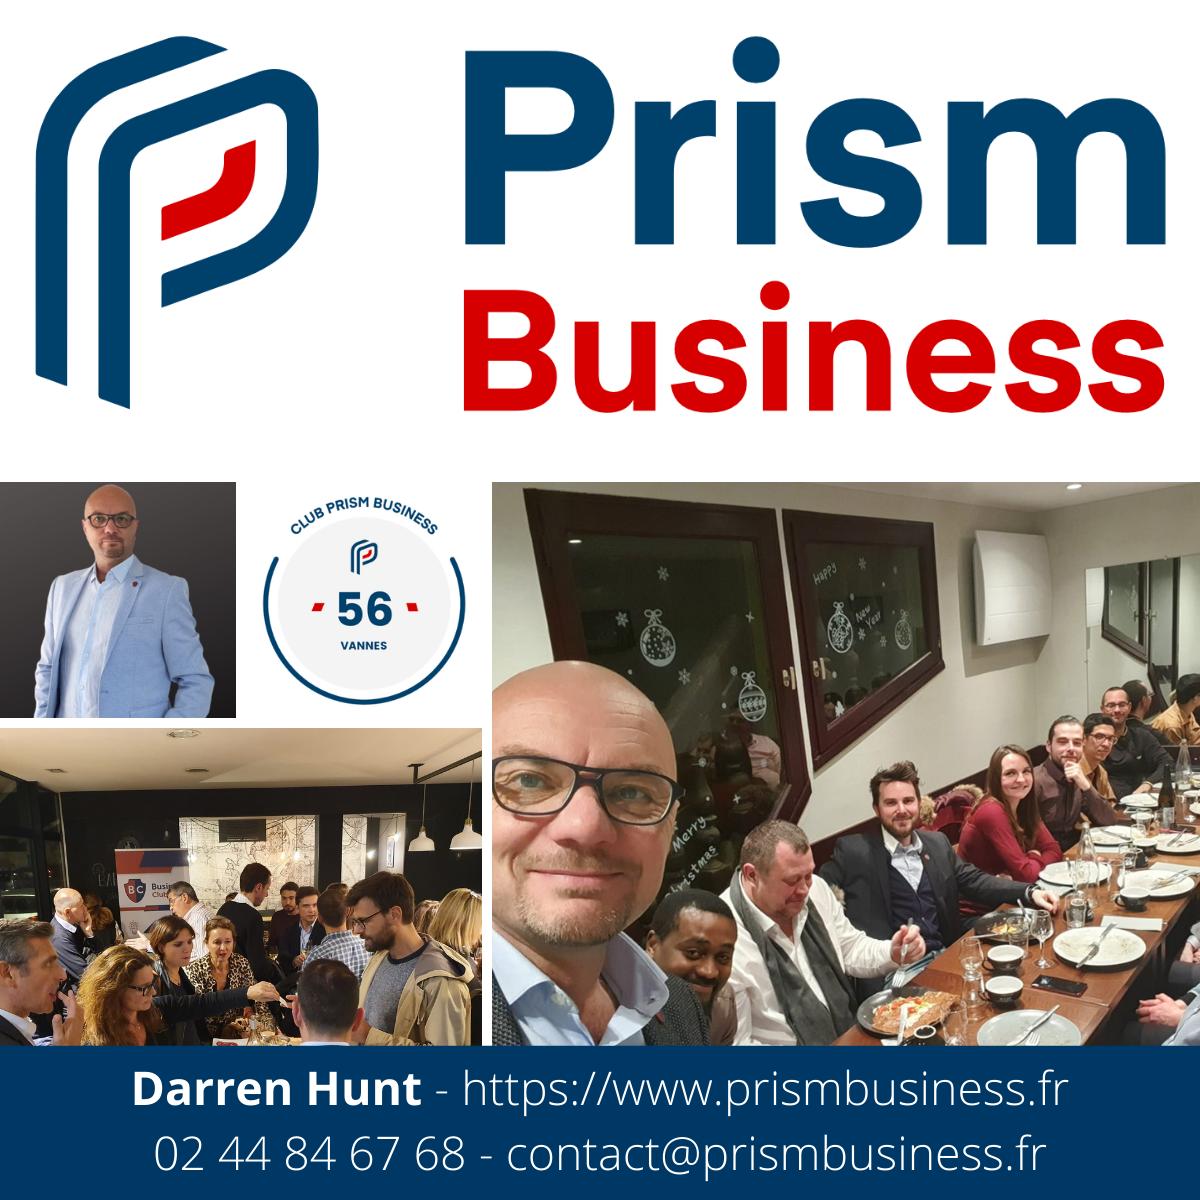 2 Prism  Business     Darren Hunt - https://www.prismbusiness.fr 02 44 84 67 68 - contact@prismbusiness.fr